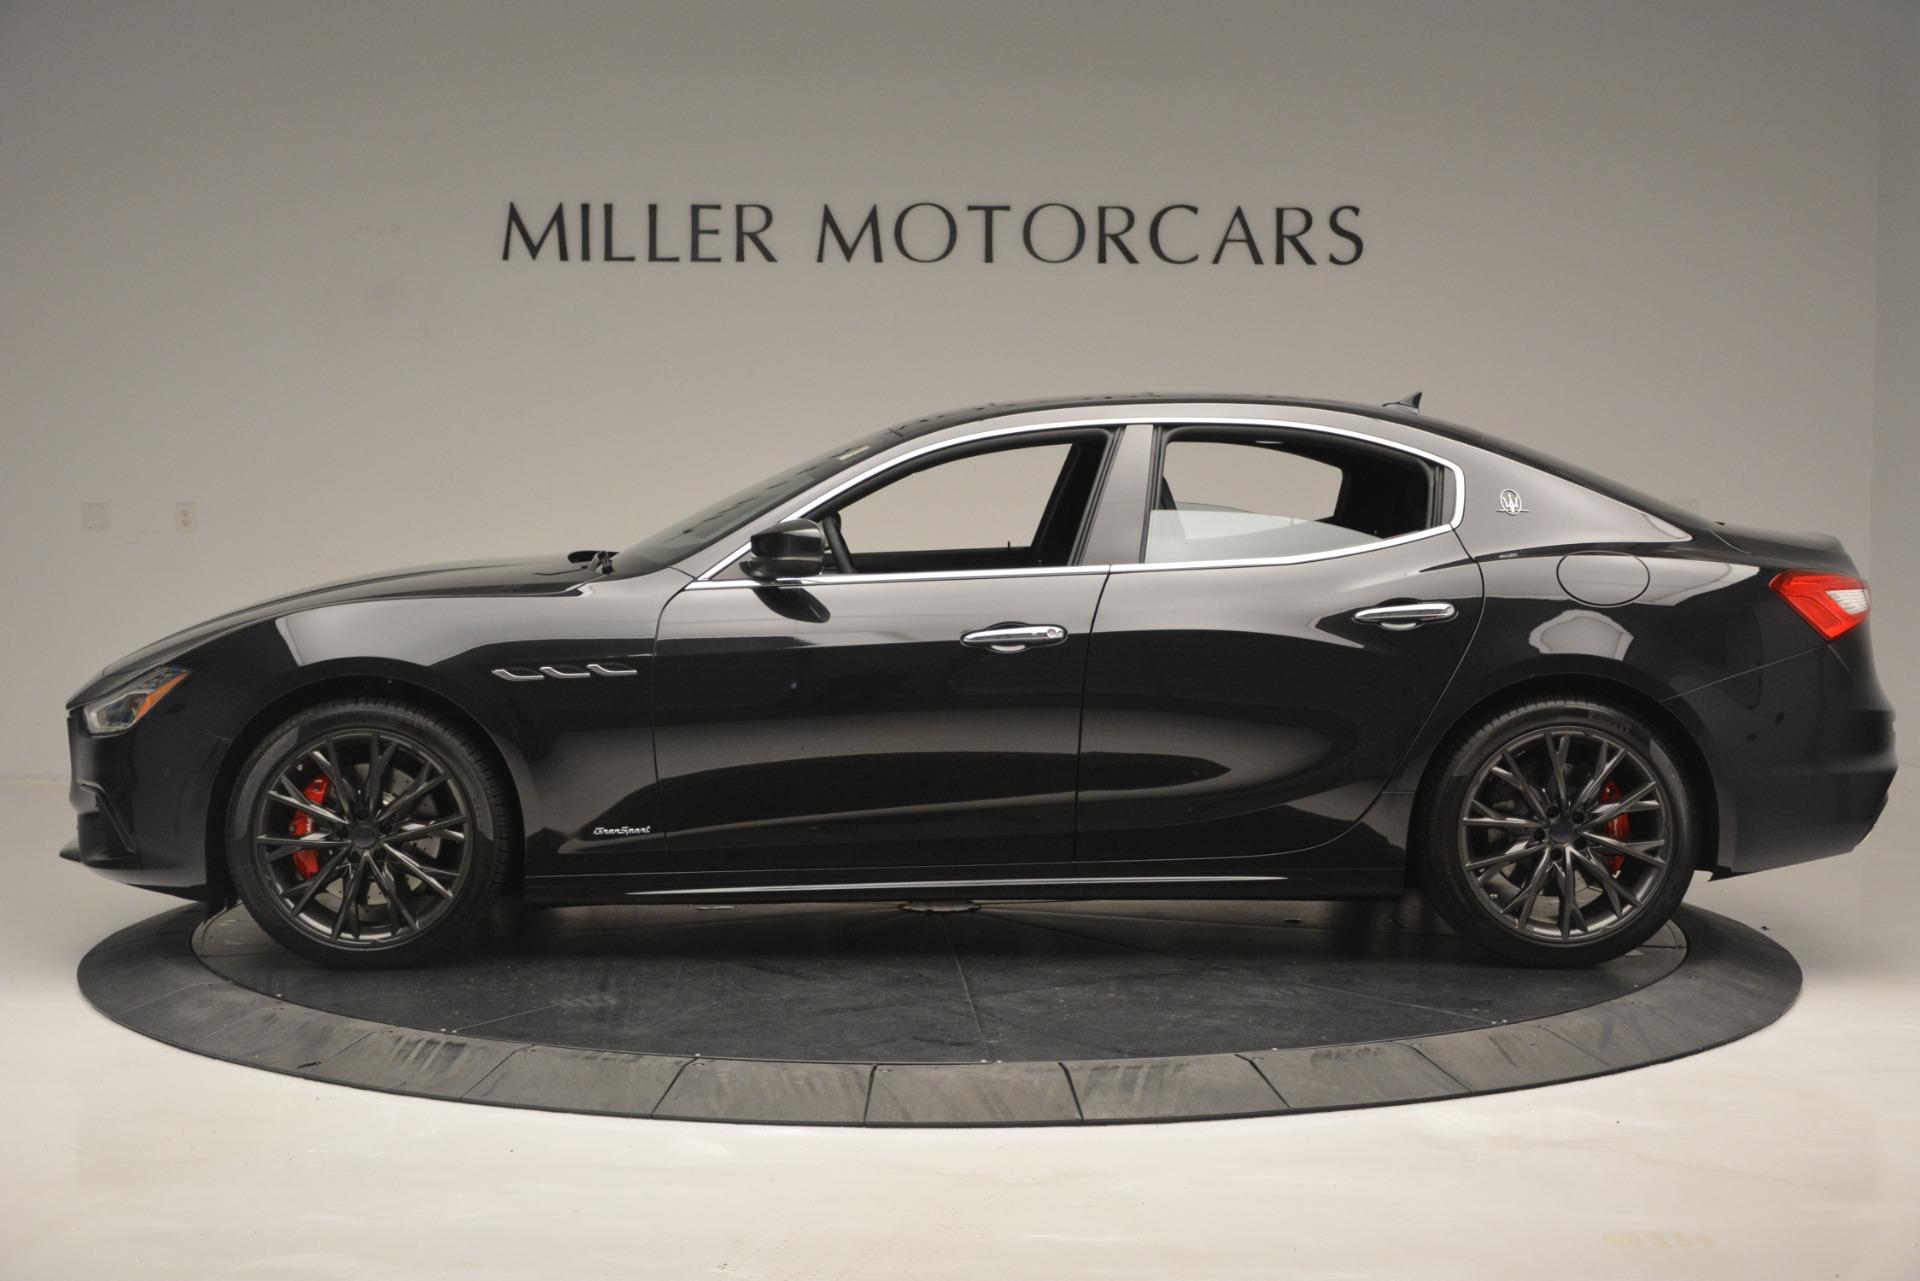 New 2019 Maserati Ghibli S Q4 GranSport For Sale In Greenwich, CT 2635_p3